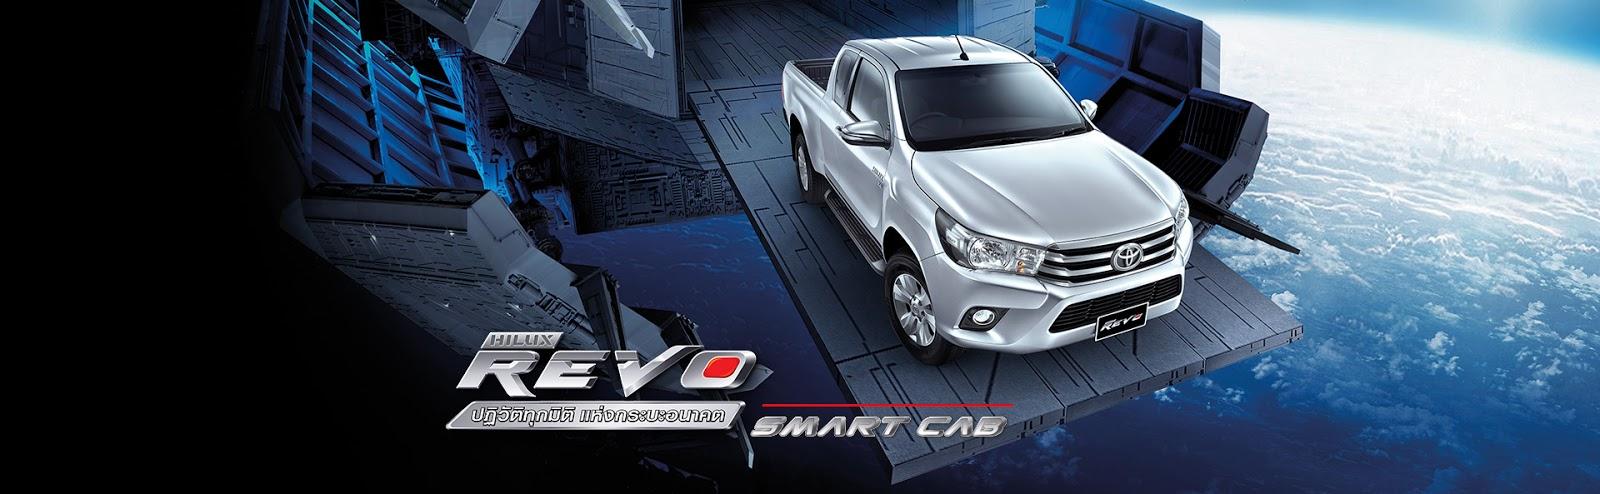 Photo of โตโยต้า ไฮลีกซ์ รีโว่รุ่นสมาร์แคป Toyota Hilux Revo Smart Cab